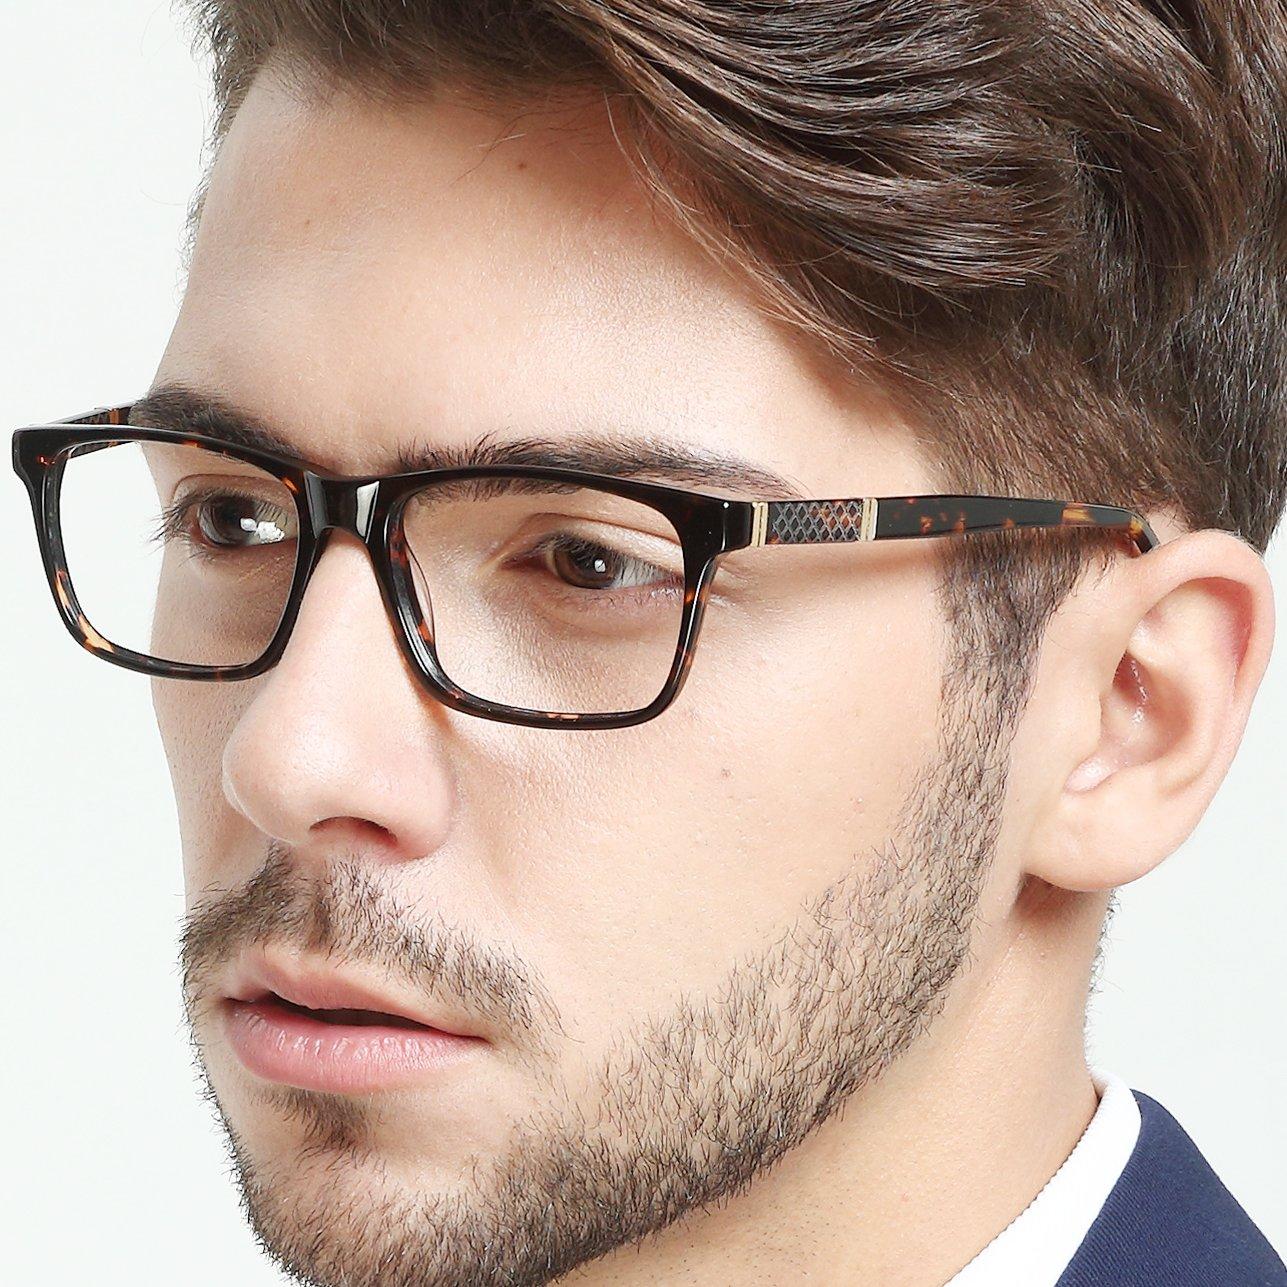 c1427c2a27a OCCI CHIARI Men Fashion Rectangle Stylish Eyewear Frame With Non-Prescription  Clear Lens 54) larger image